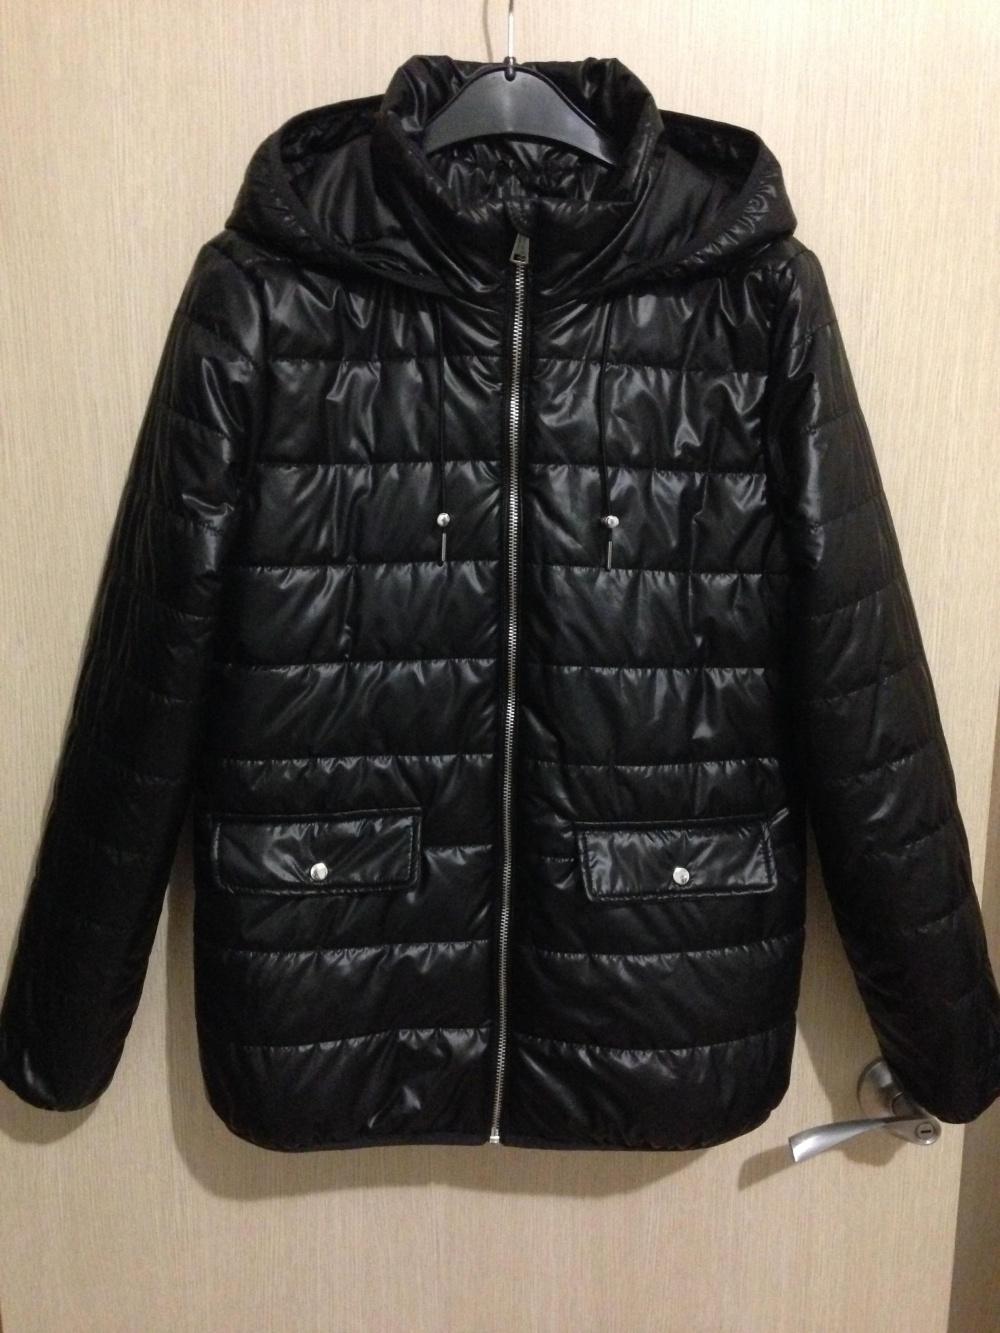 "Курточка "" Marks Spencer "", 48 размер"